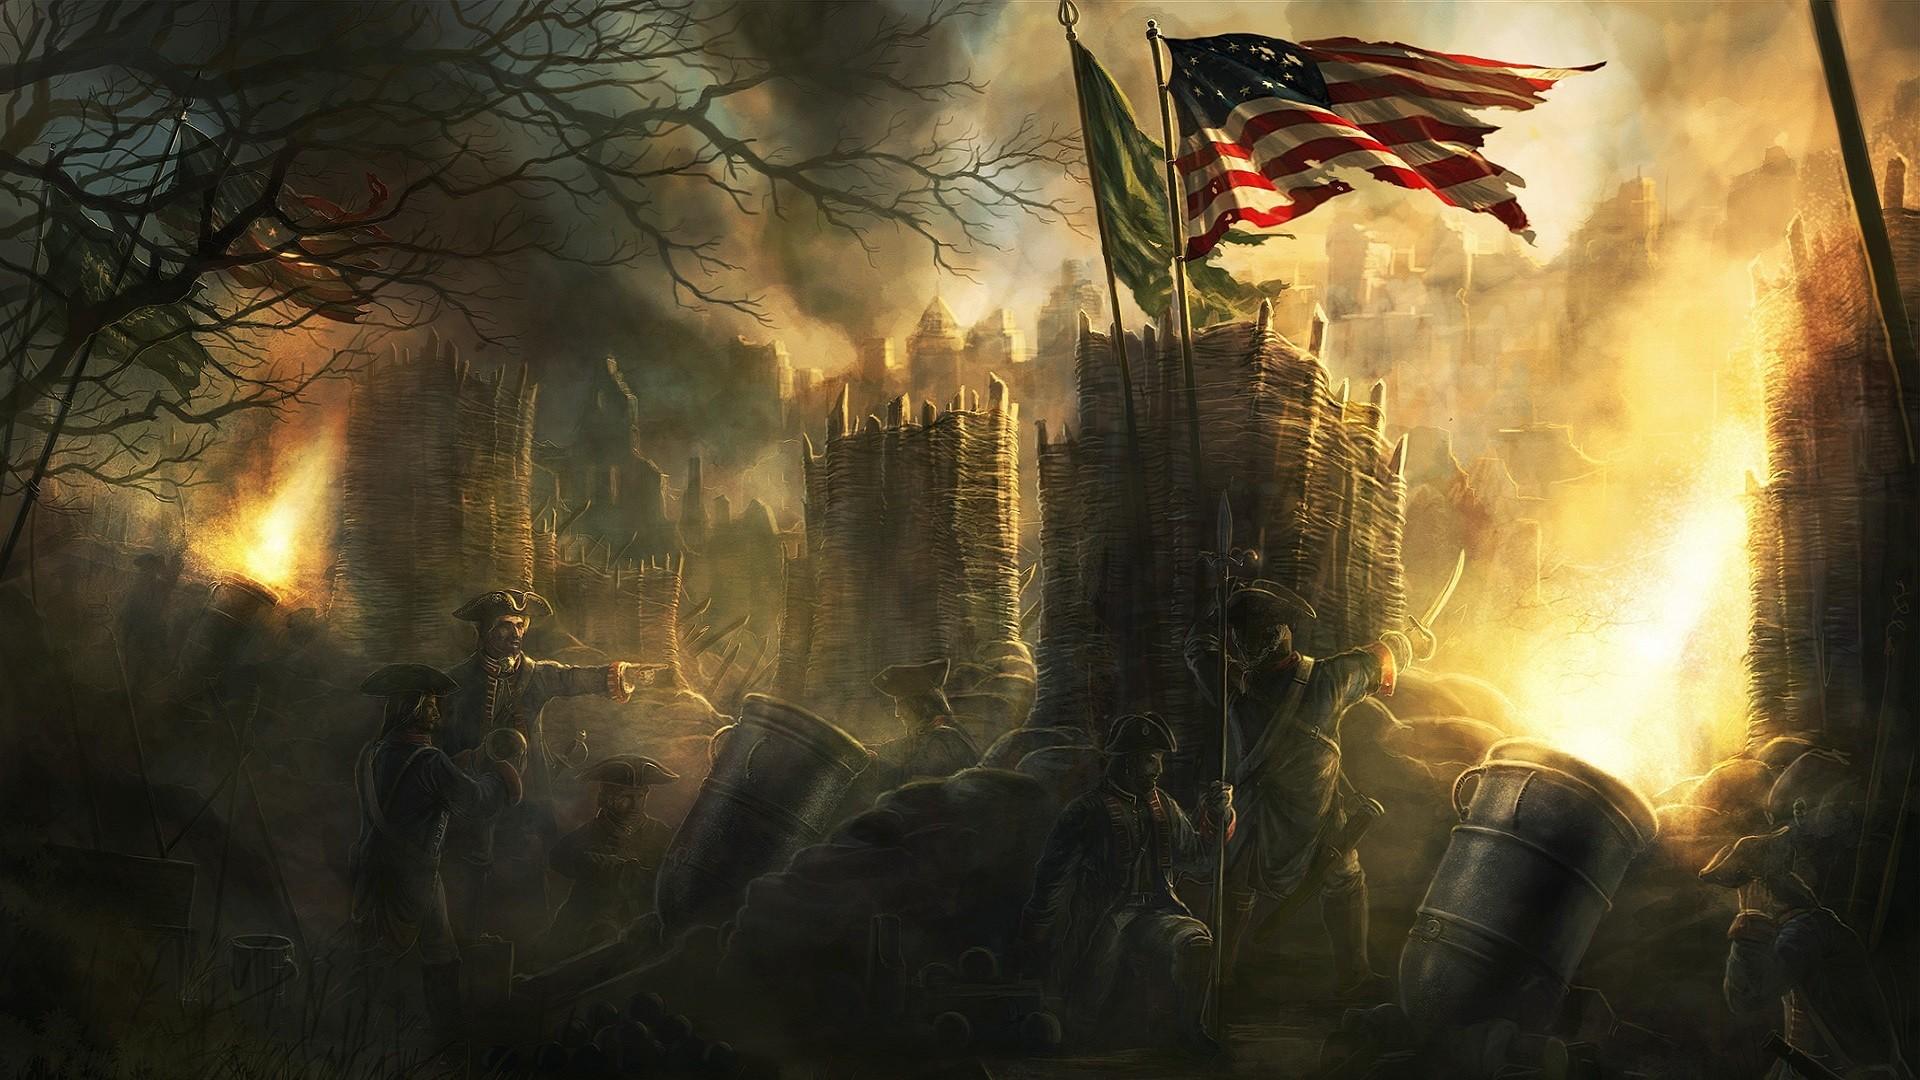 Plants vs Zombies Garden Warfare Free Download for PC